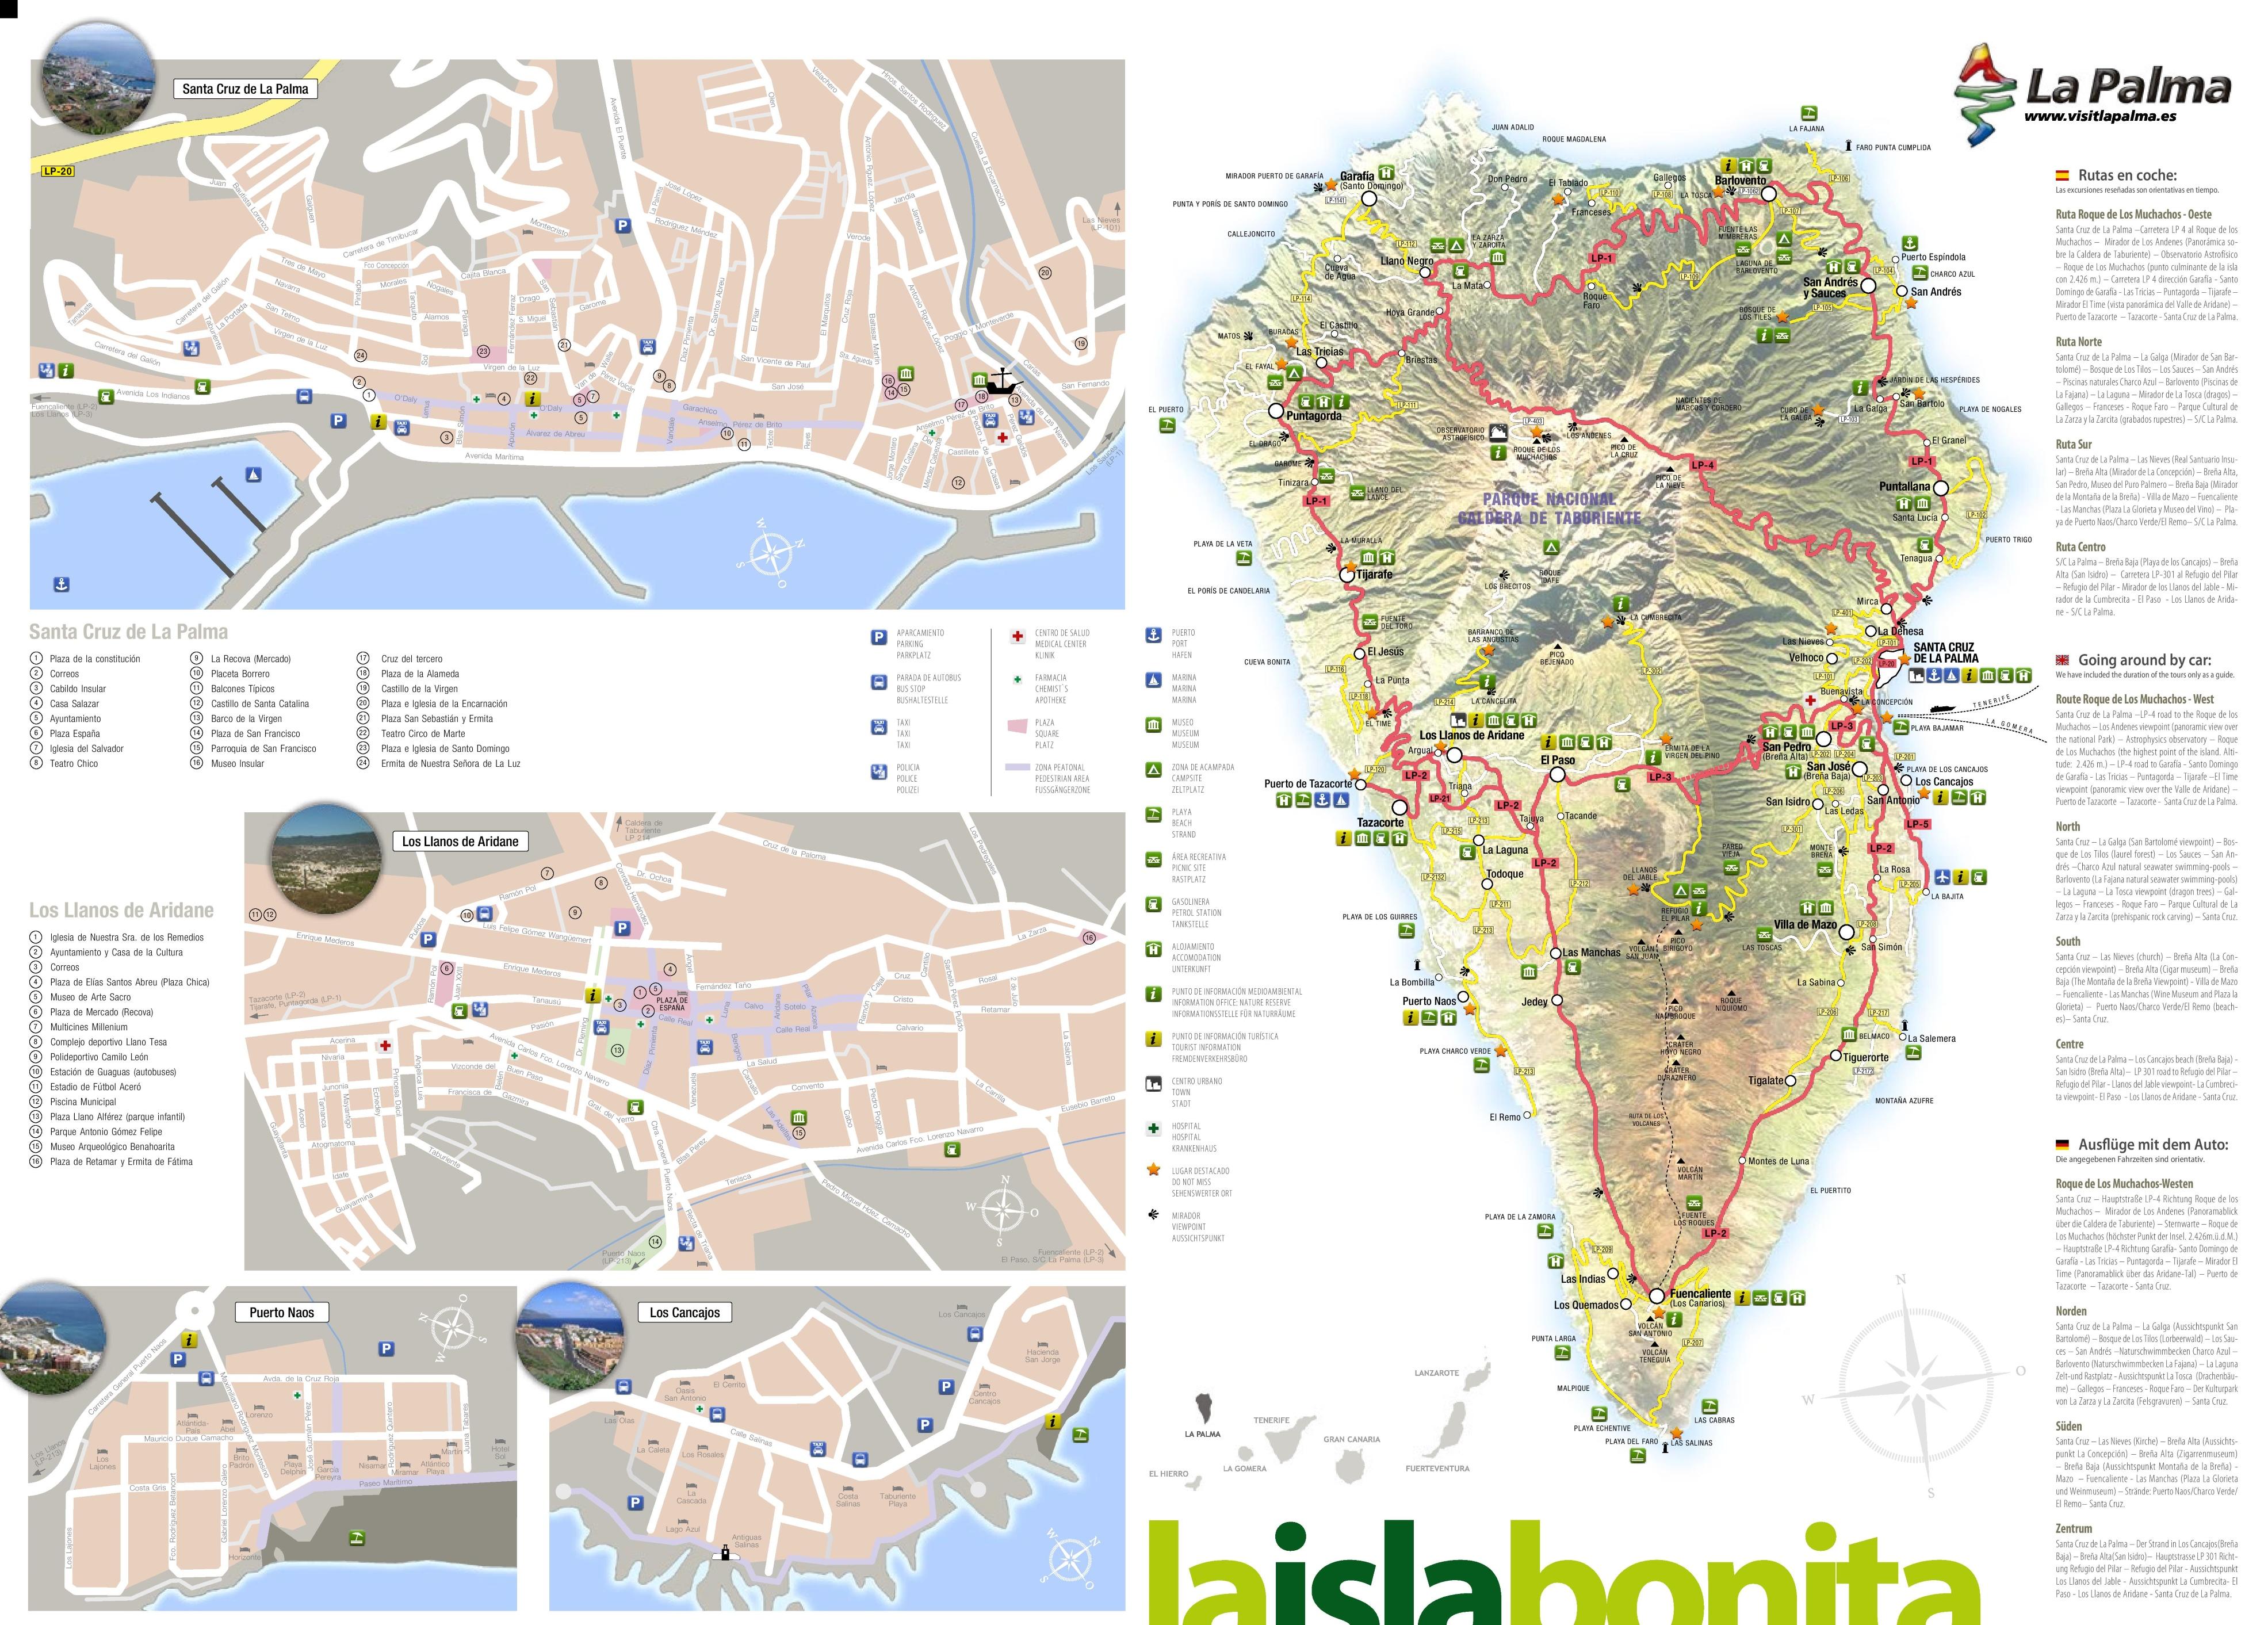 La Palma tourist map